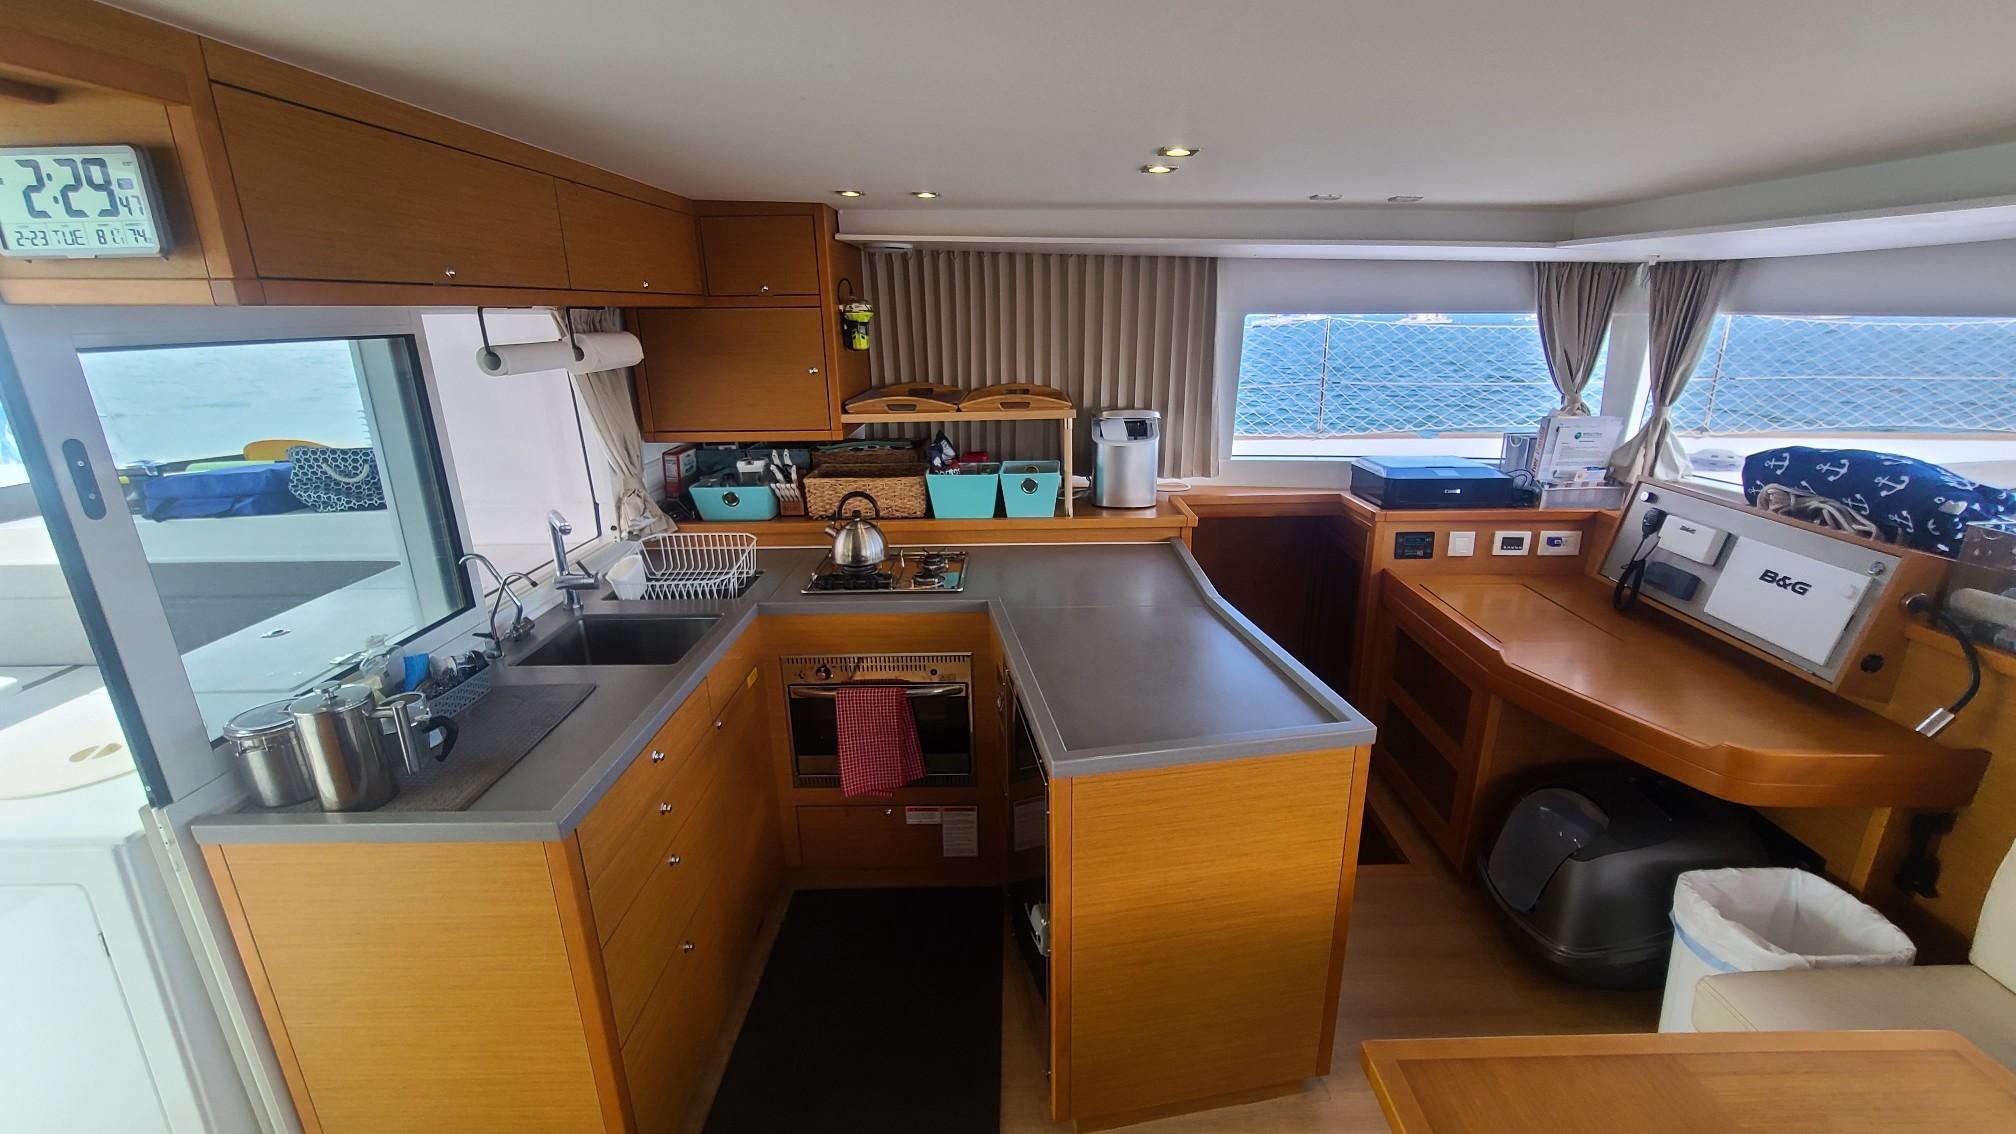 Lagoon 450 Catamaran sold by Just Catamarans